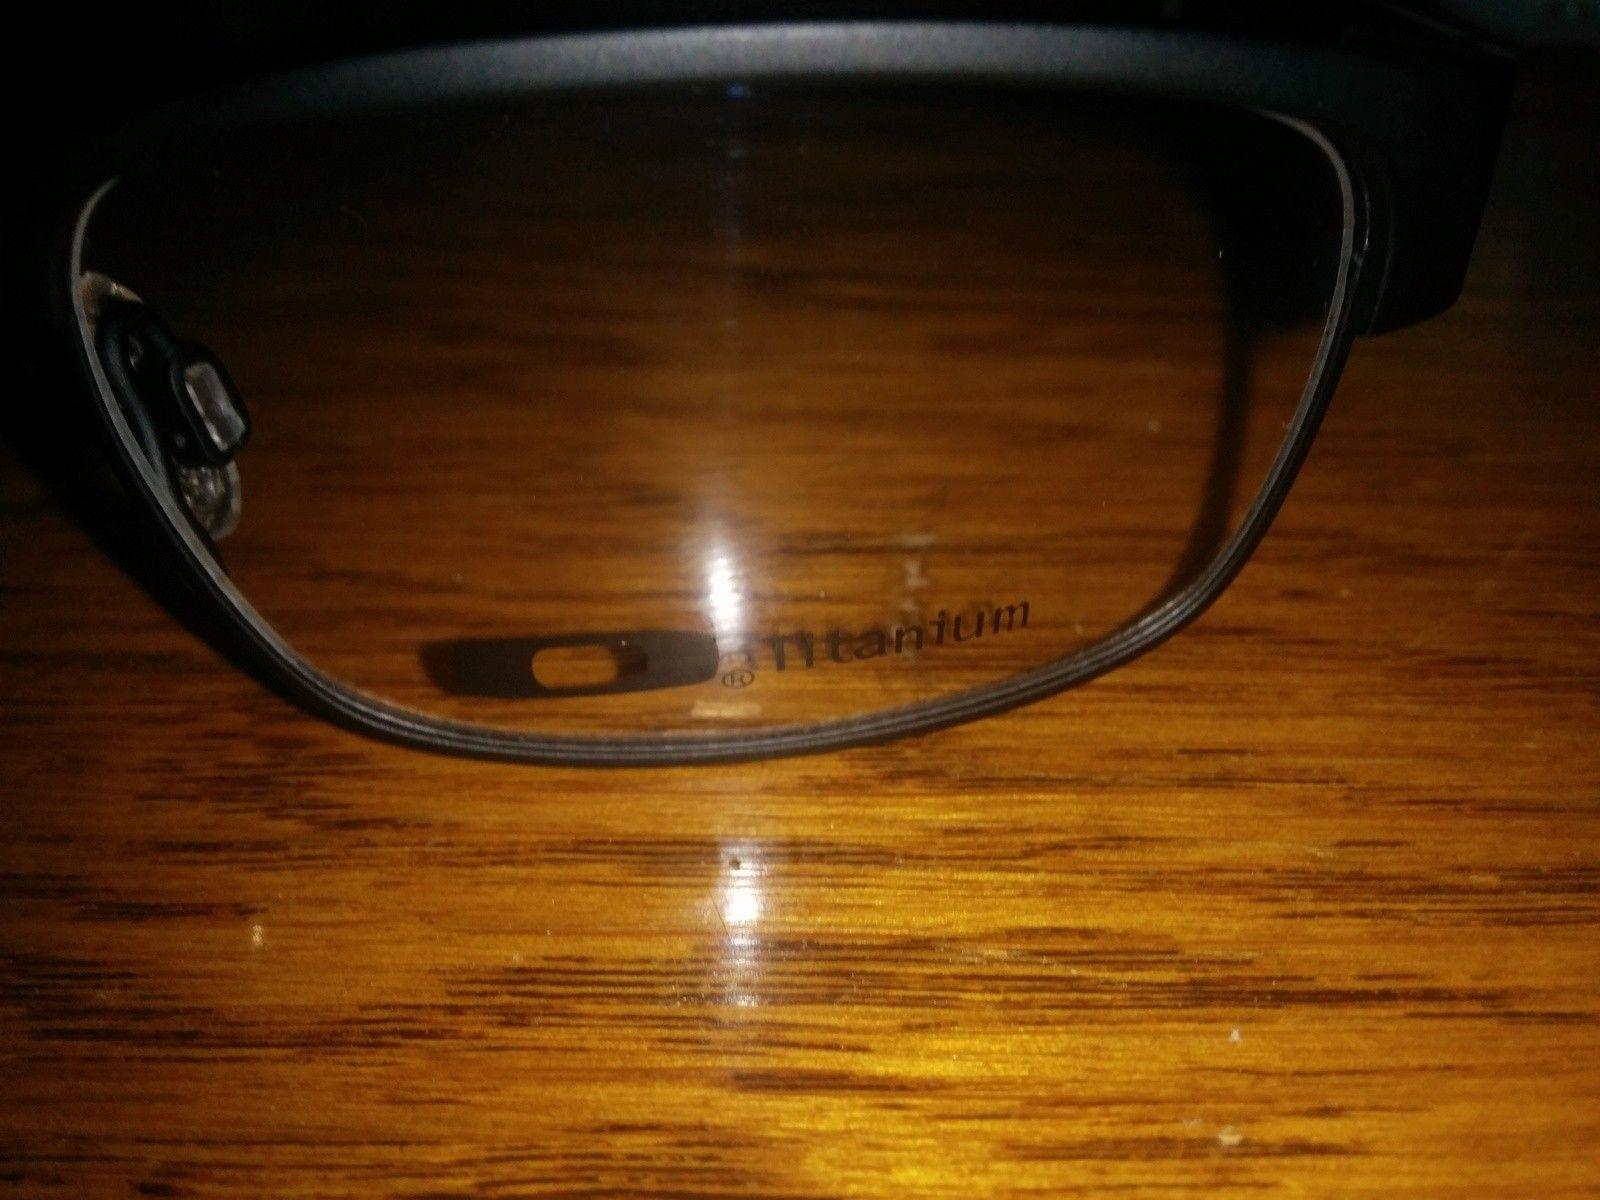 Oakley Carbon Plate Authenticity - uploadfromtaptalk1422112311043.jpg